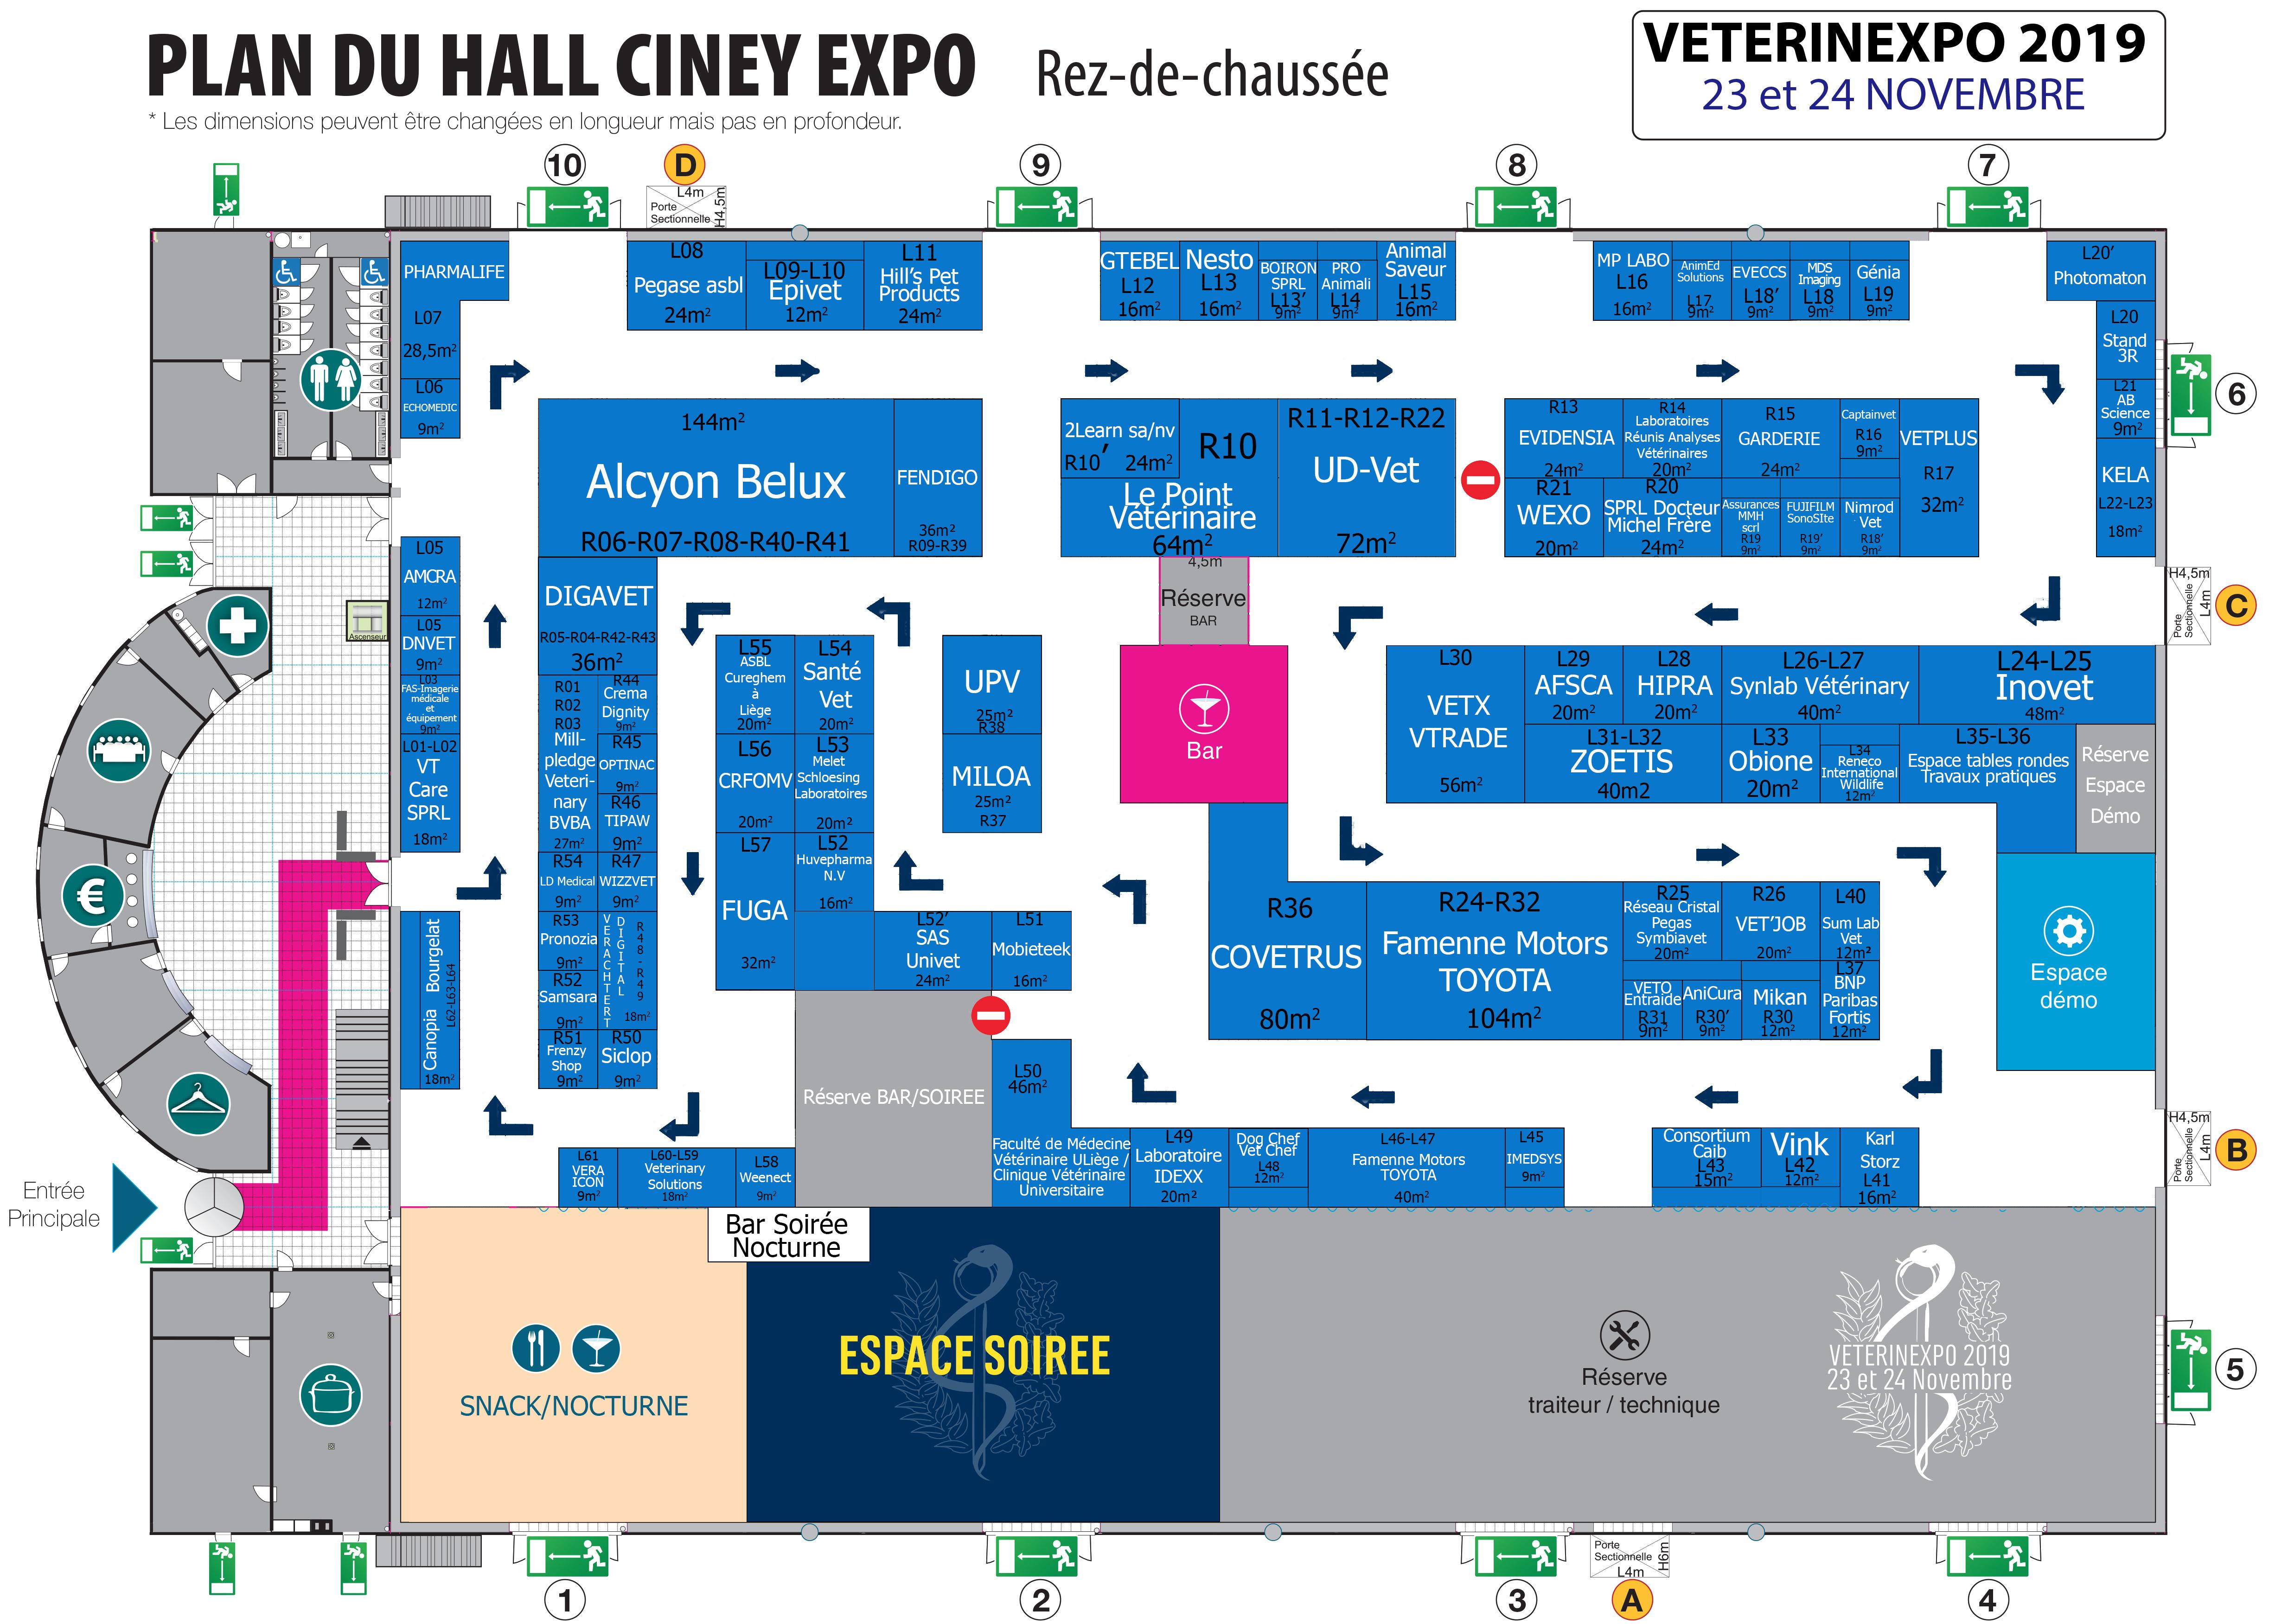 Plan du salon VétérinExpo